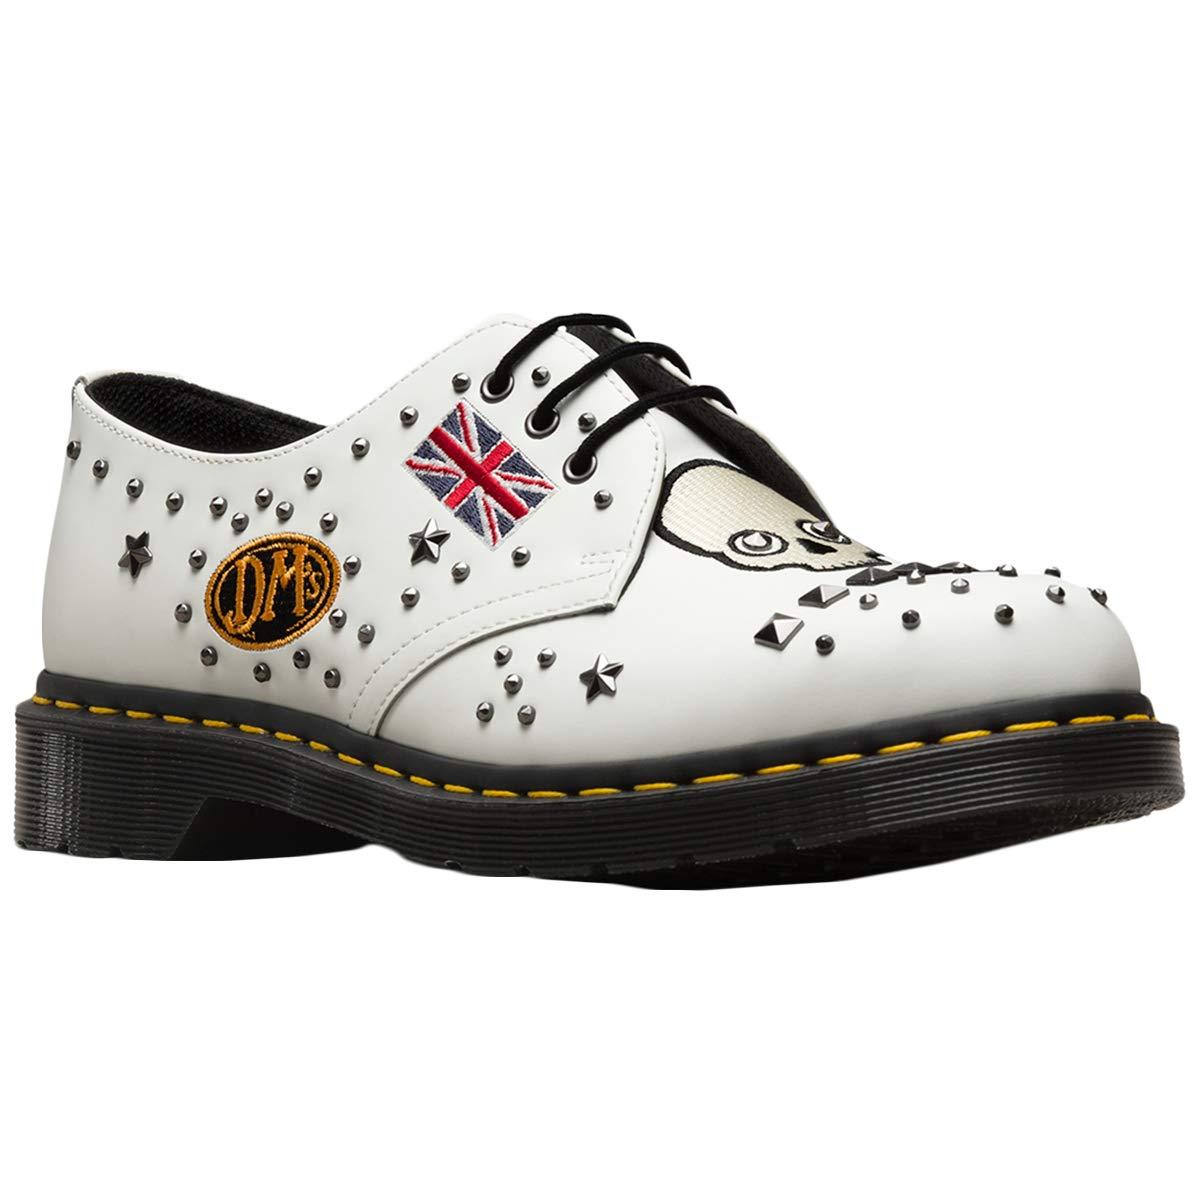 Dr. Martens Blanc 1461 Rockabilly Chaussures DR MARTENS